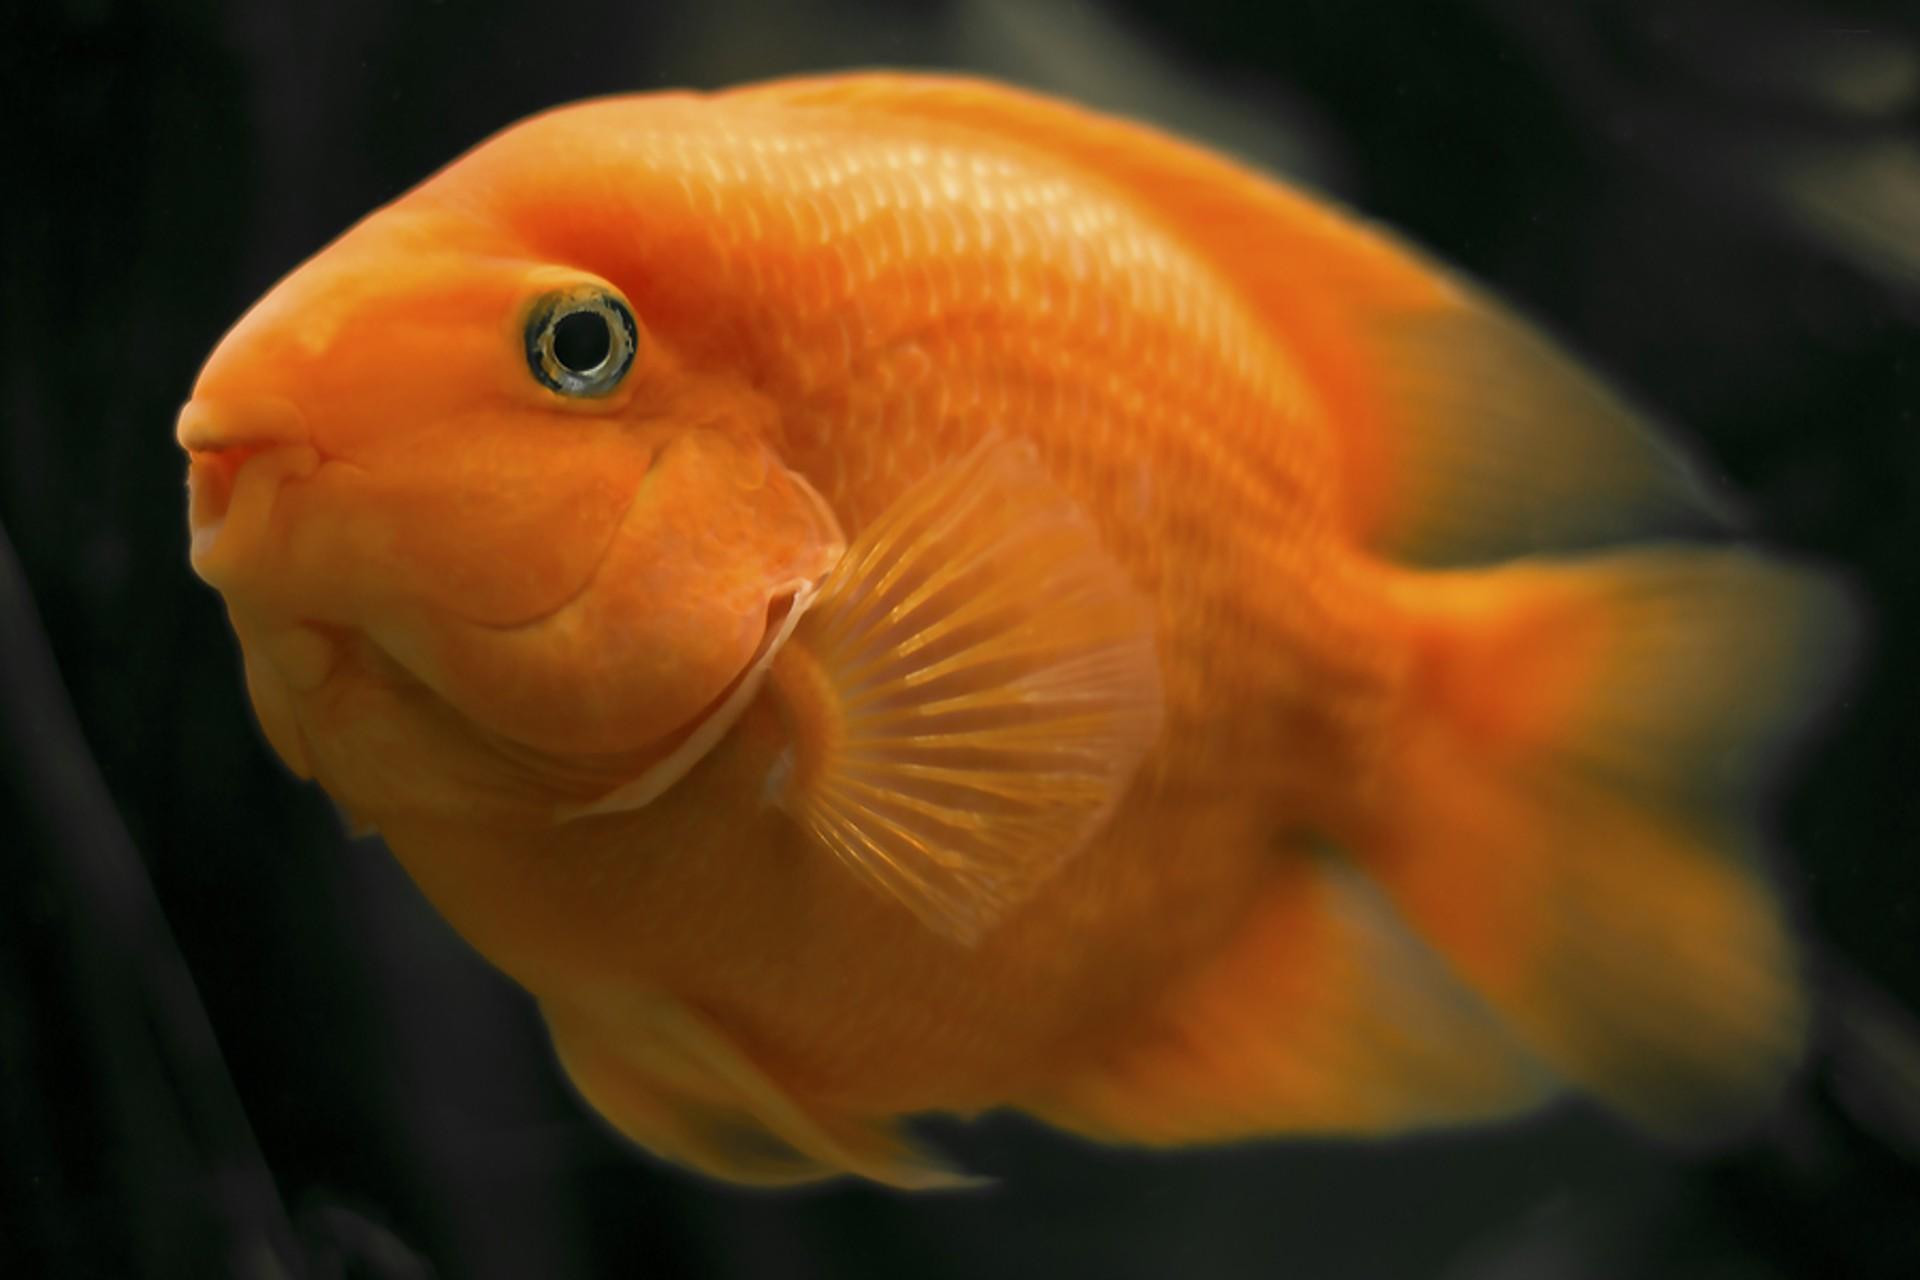 fish_1560940194388.jpg